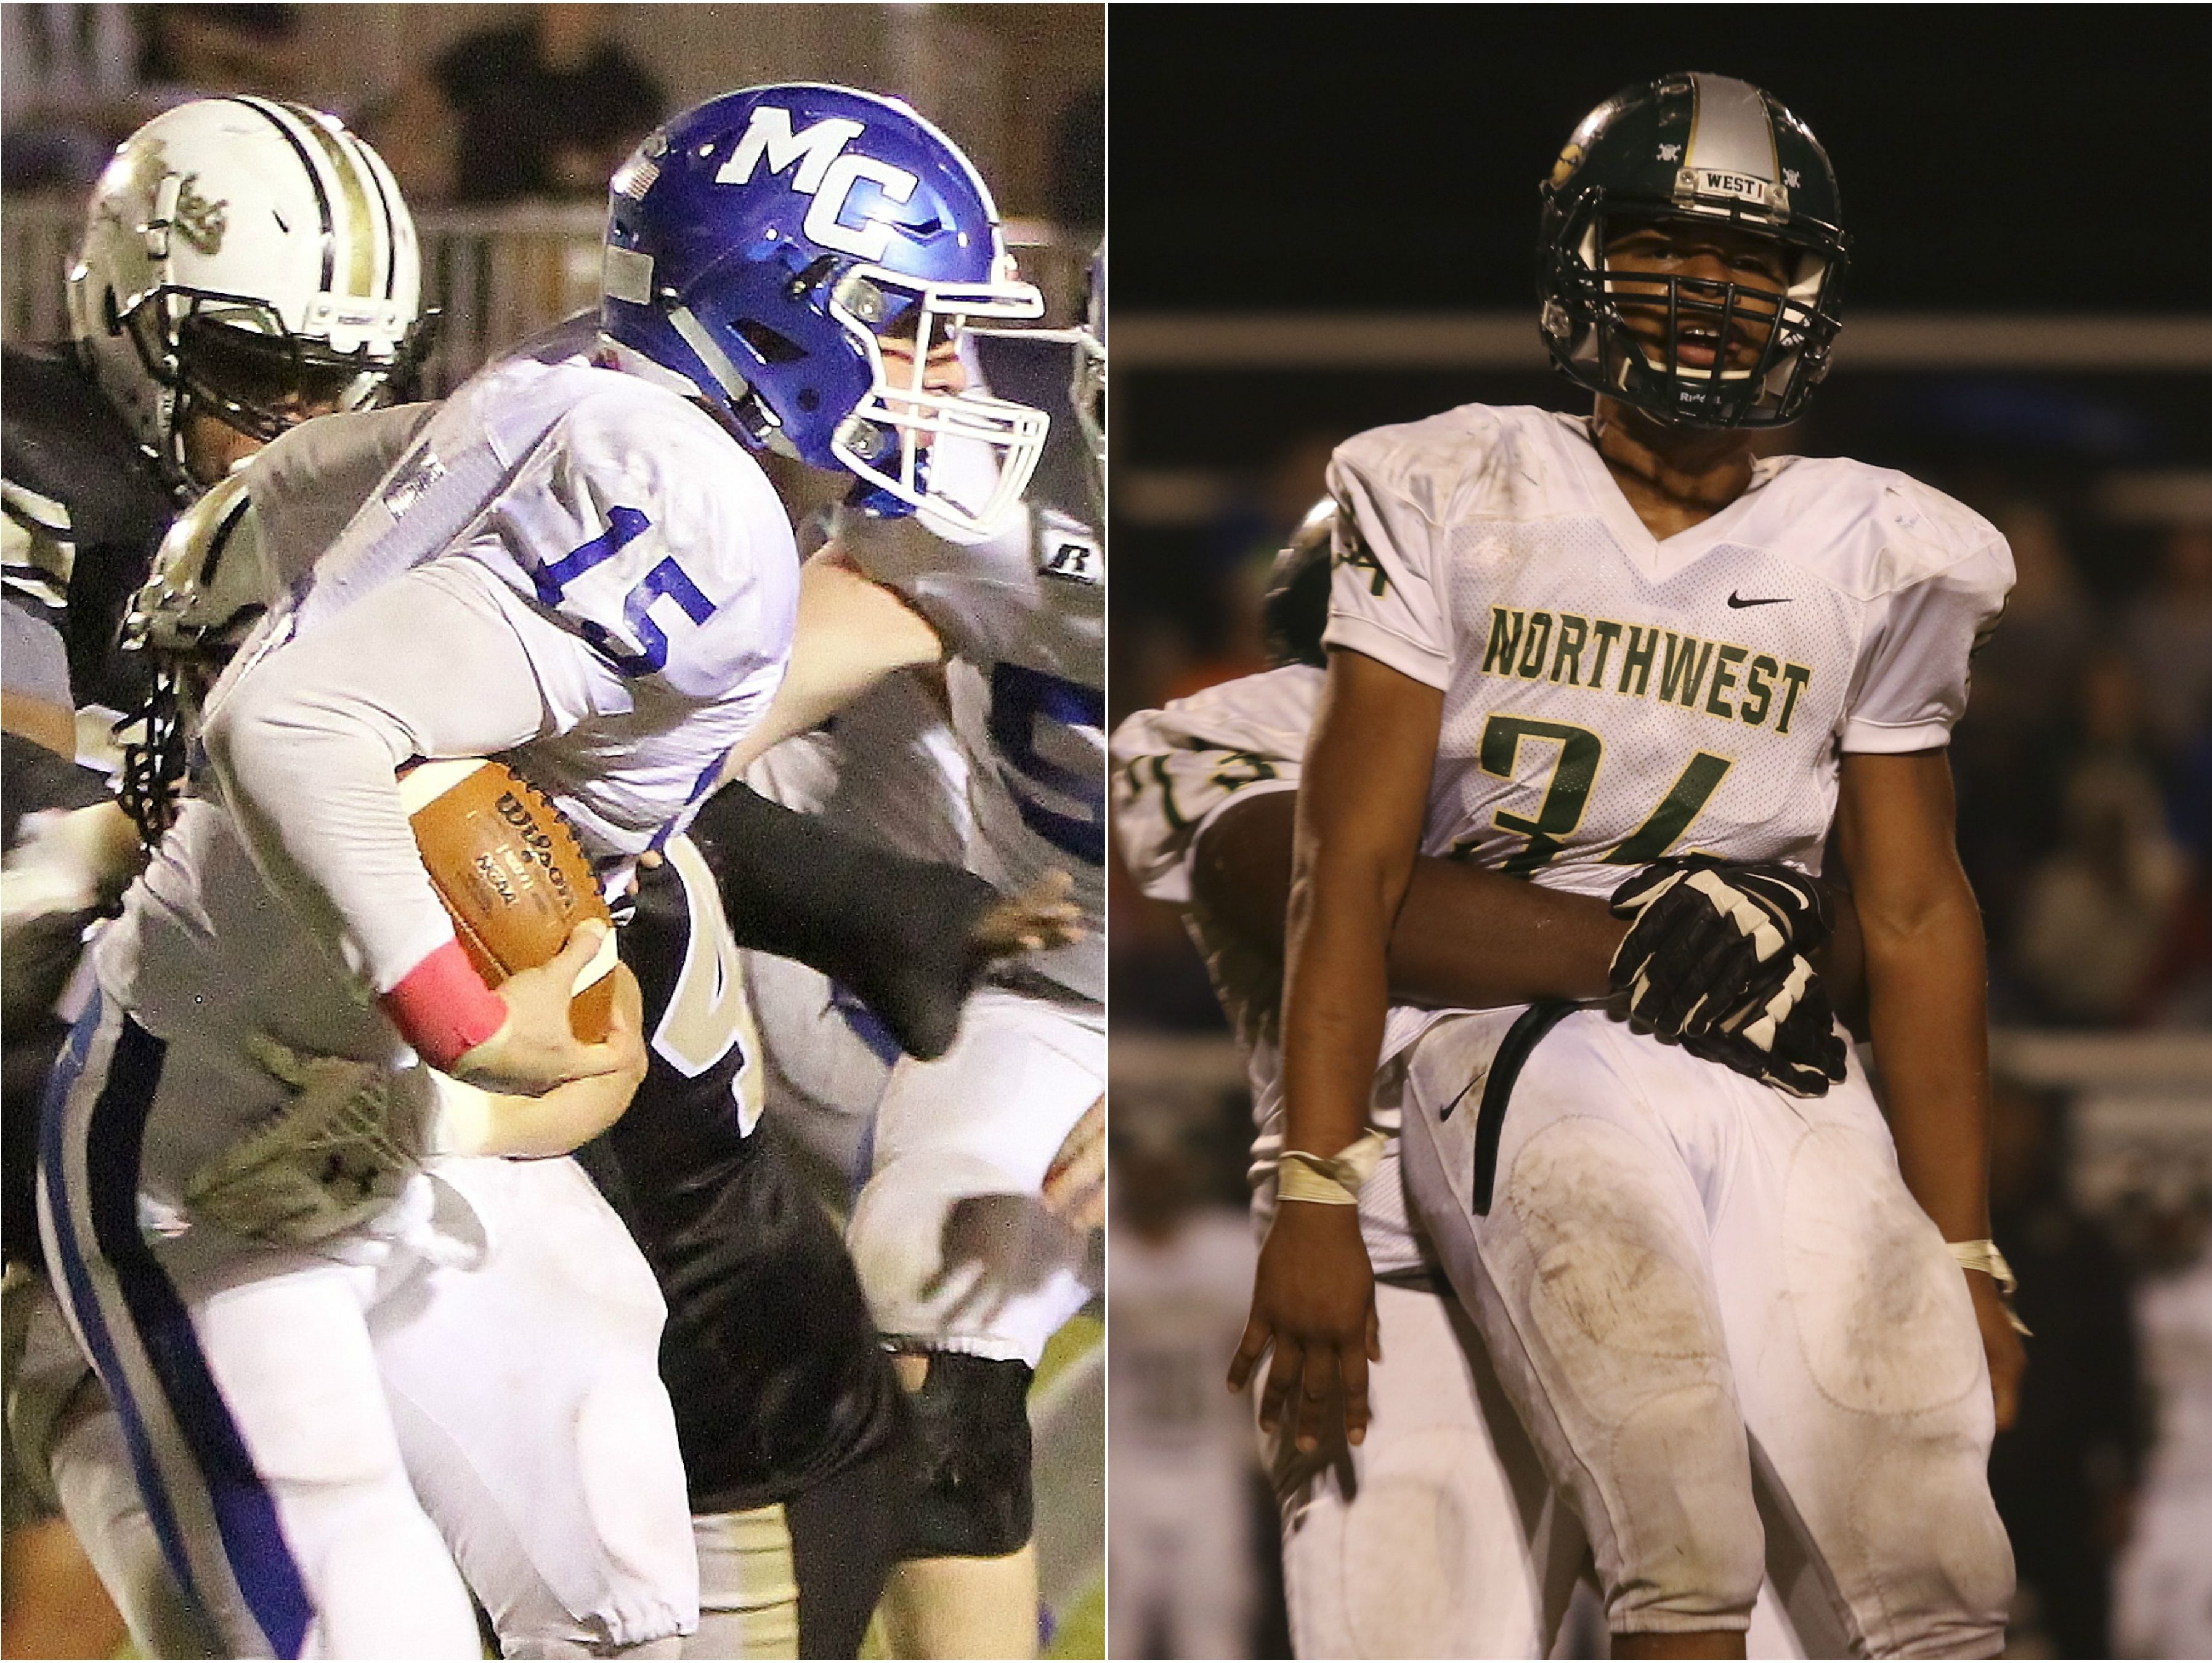 Macon County quarterback Seth Carlisle (left) and Clarksville Northwest linebacker Jaylen Jackson (right)